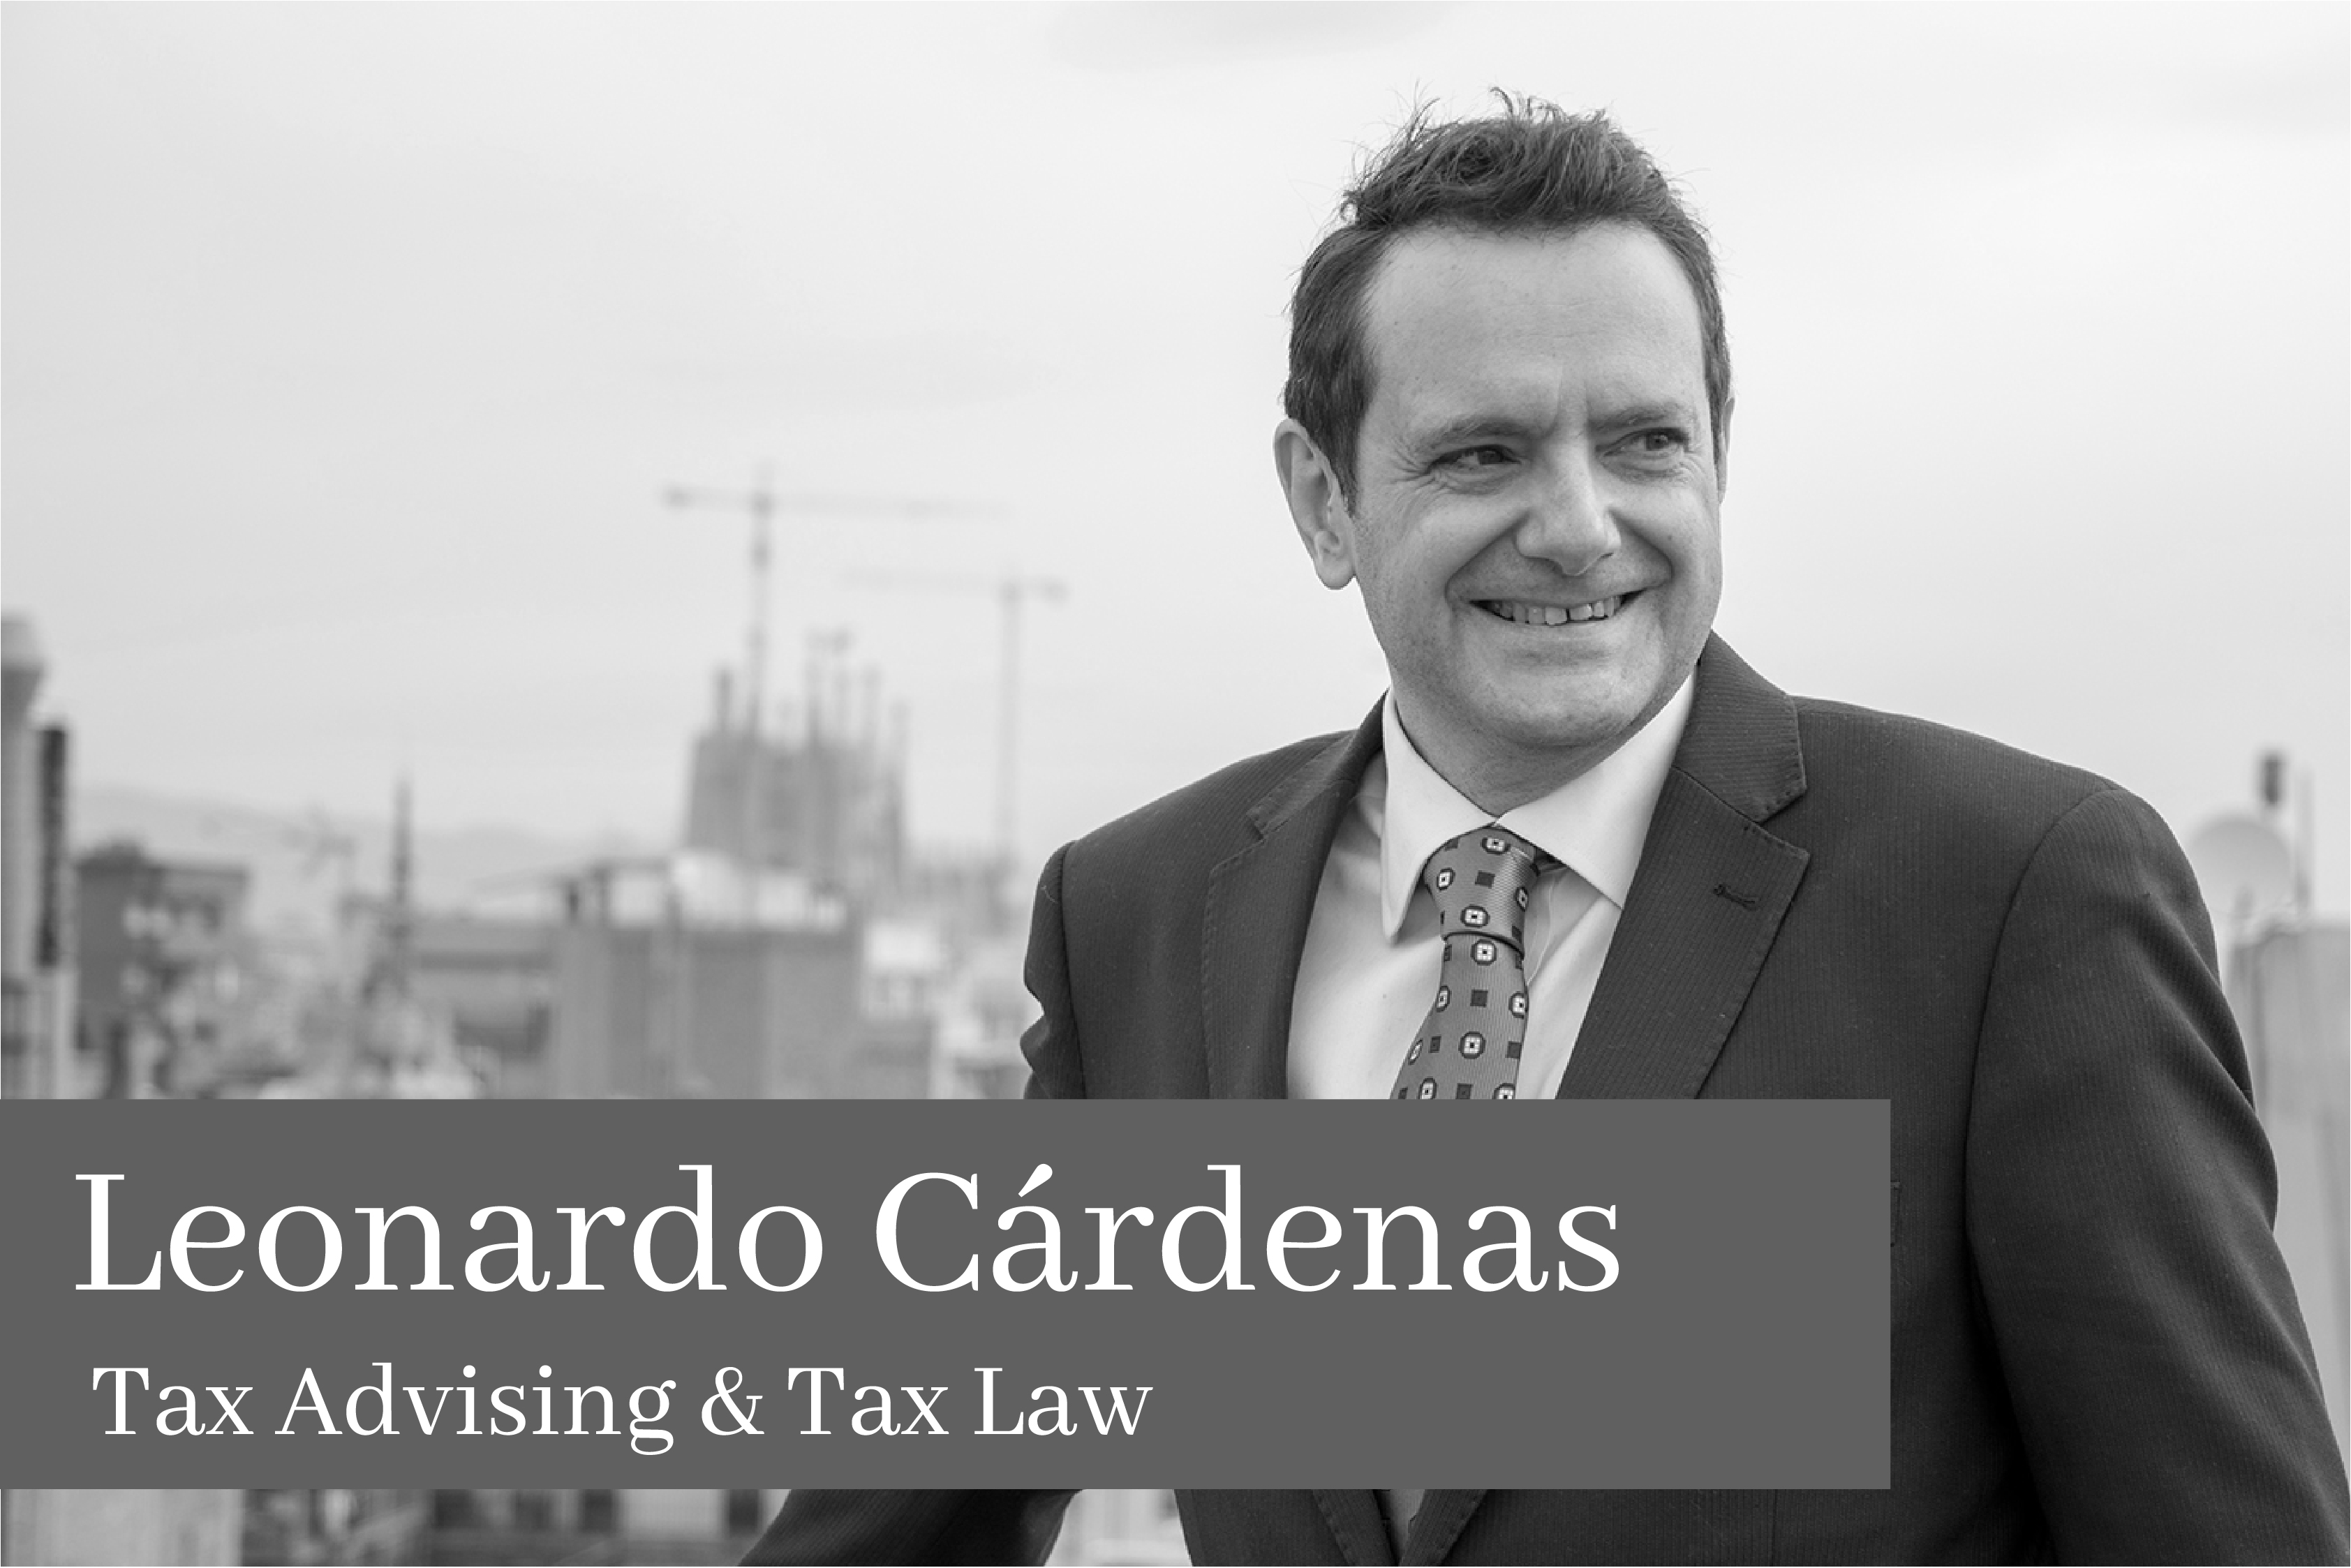 Leonardo Cárdenas Armesto Tax Advising & Tax Law